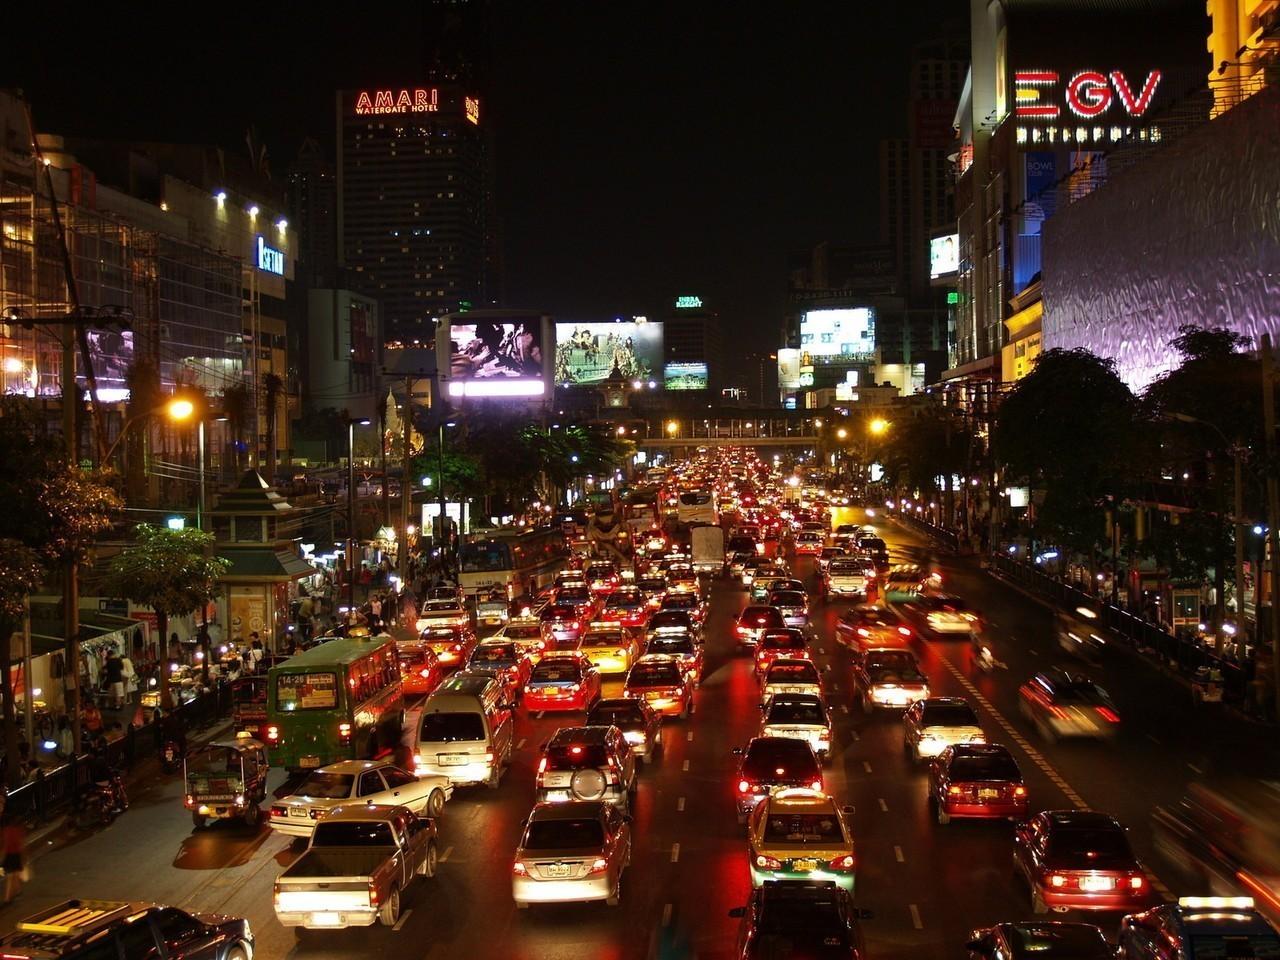 W podróży do Bangkoku